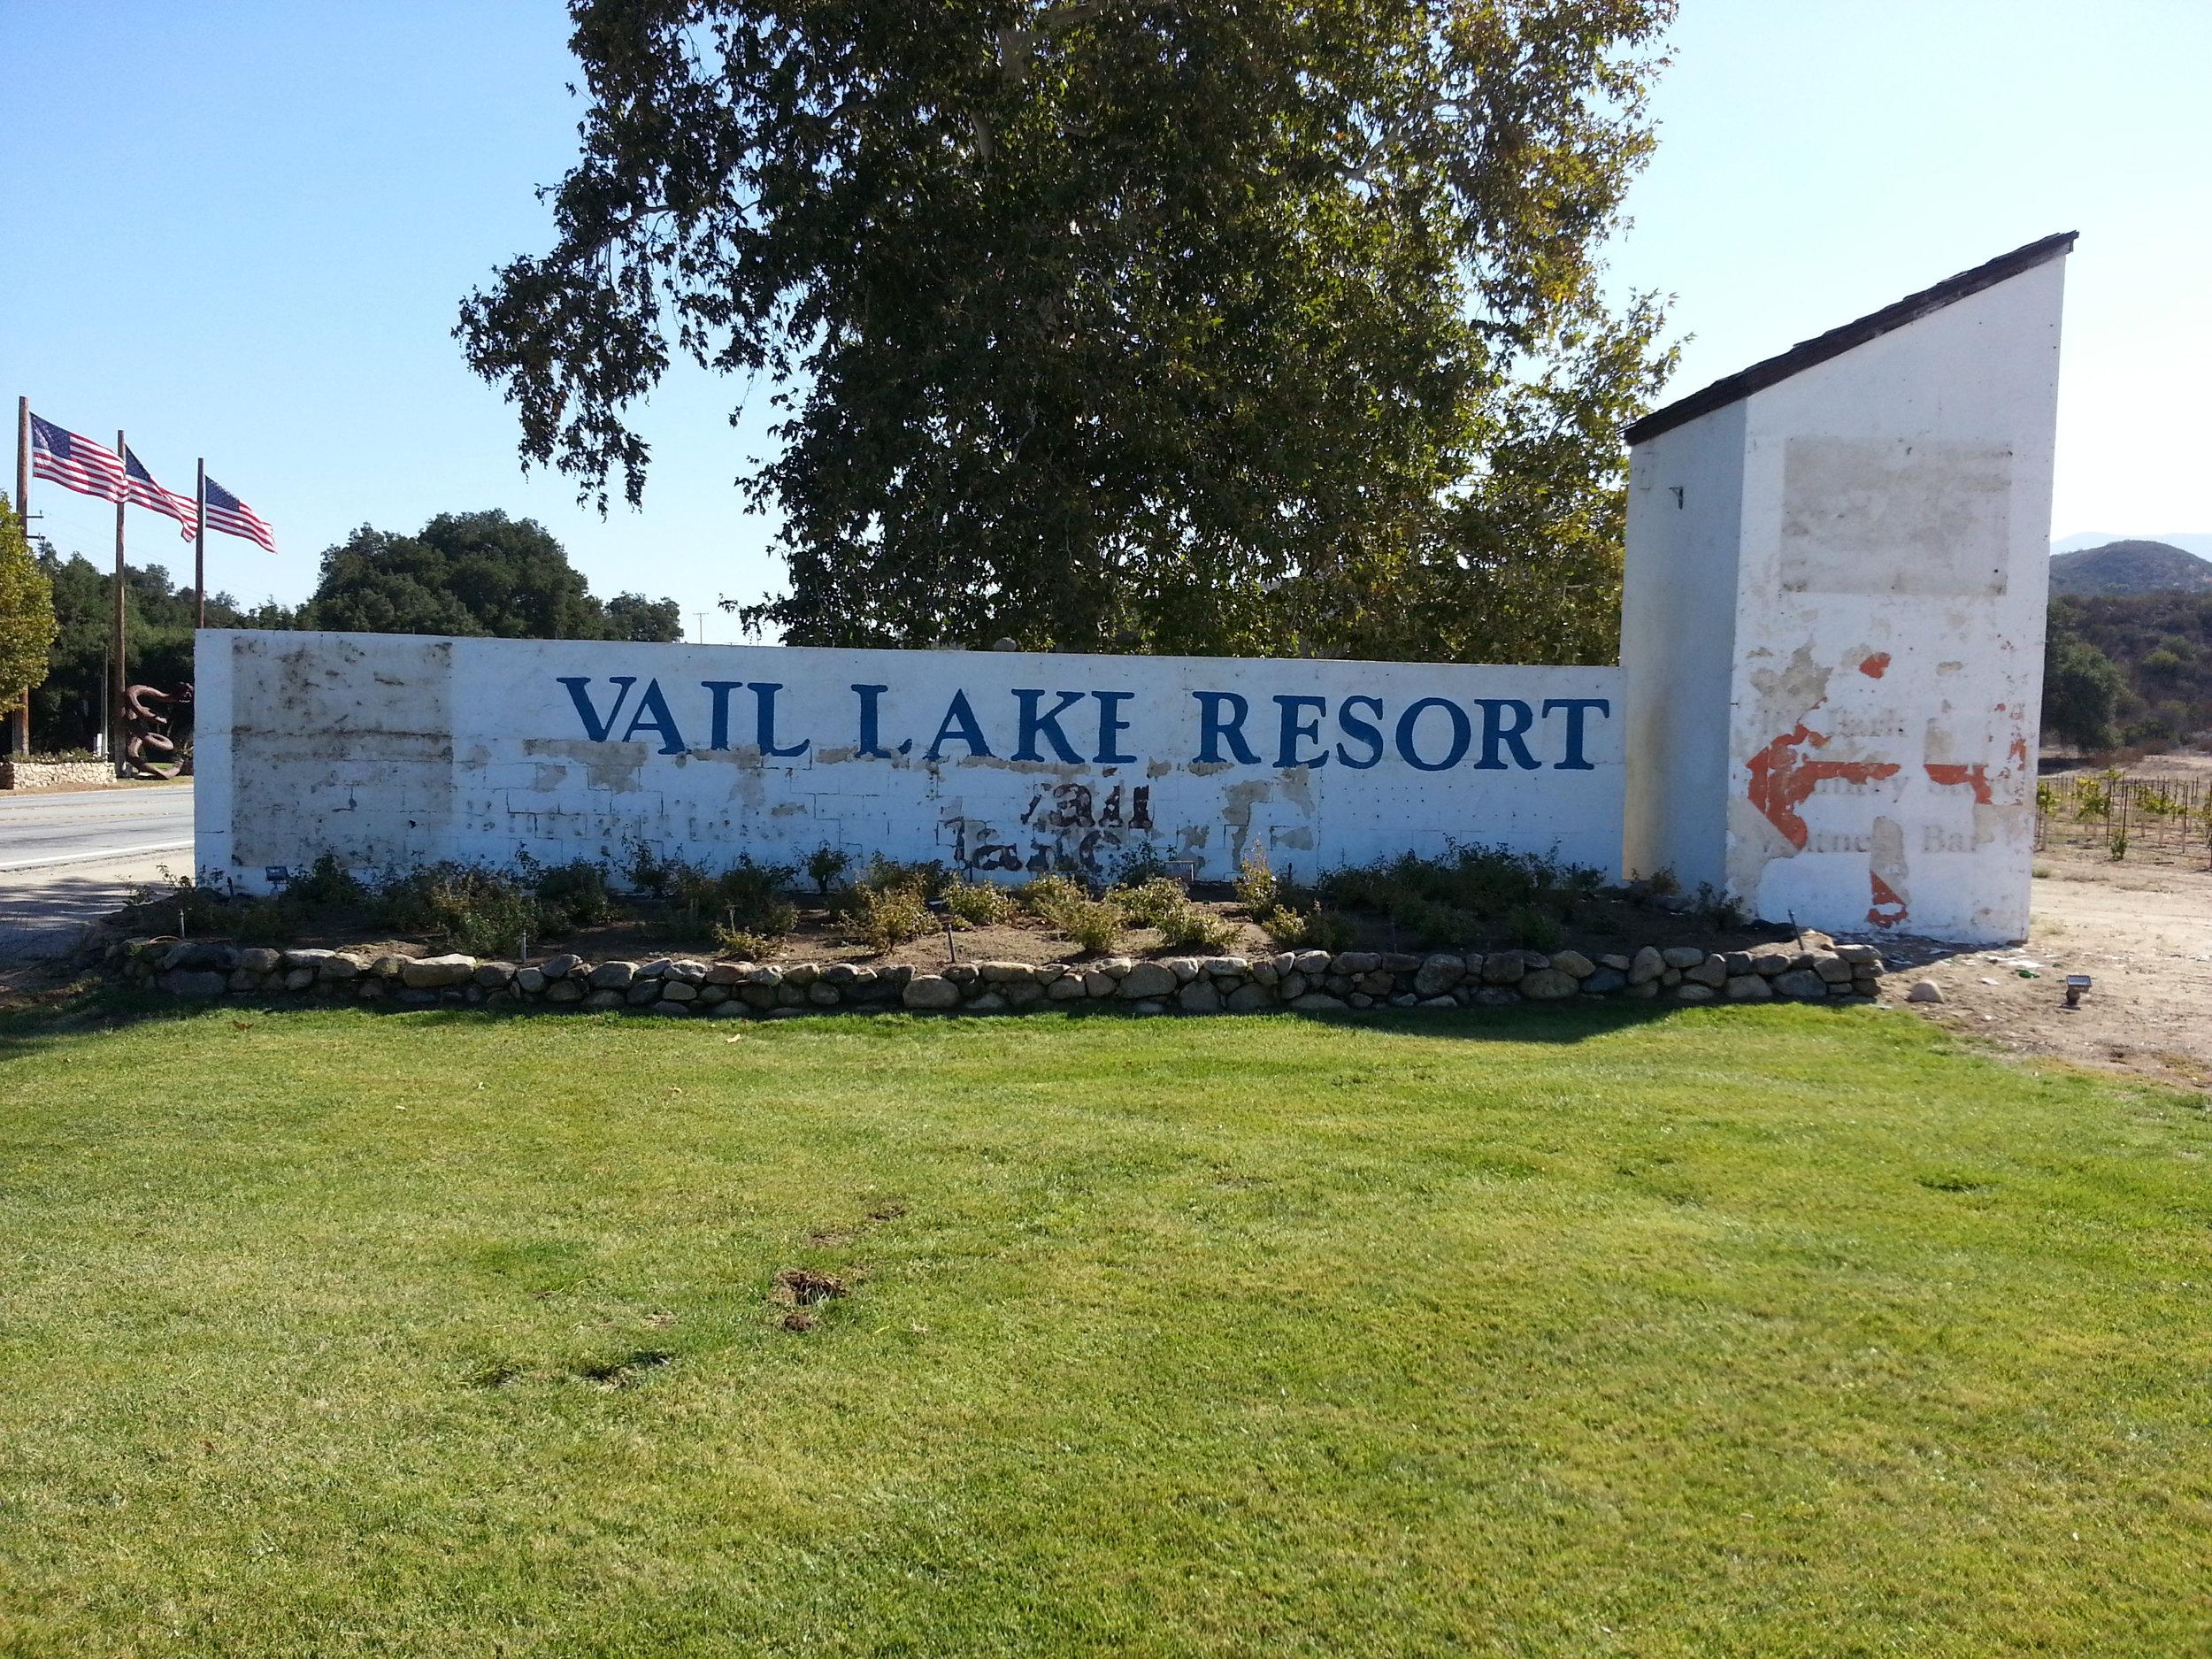 Vail Lake monument before photo Temecula CA